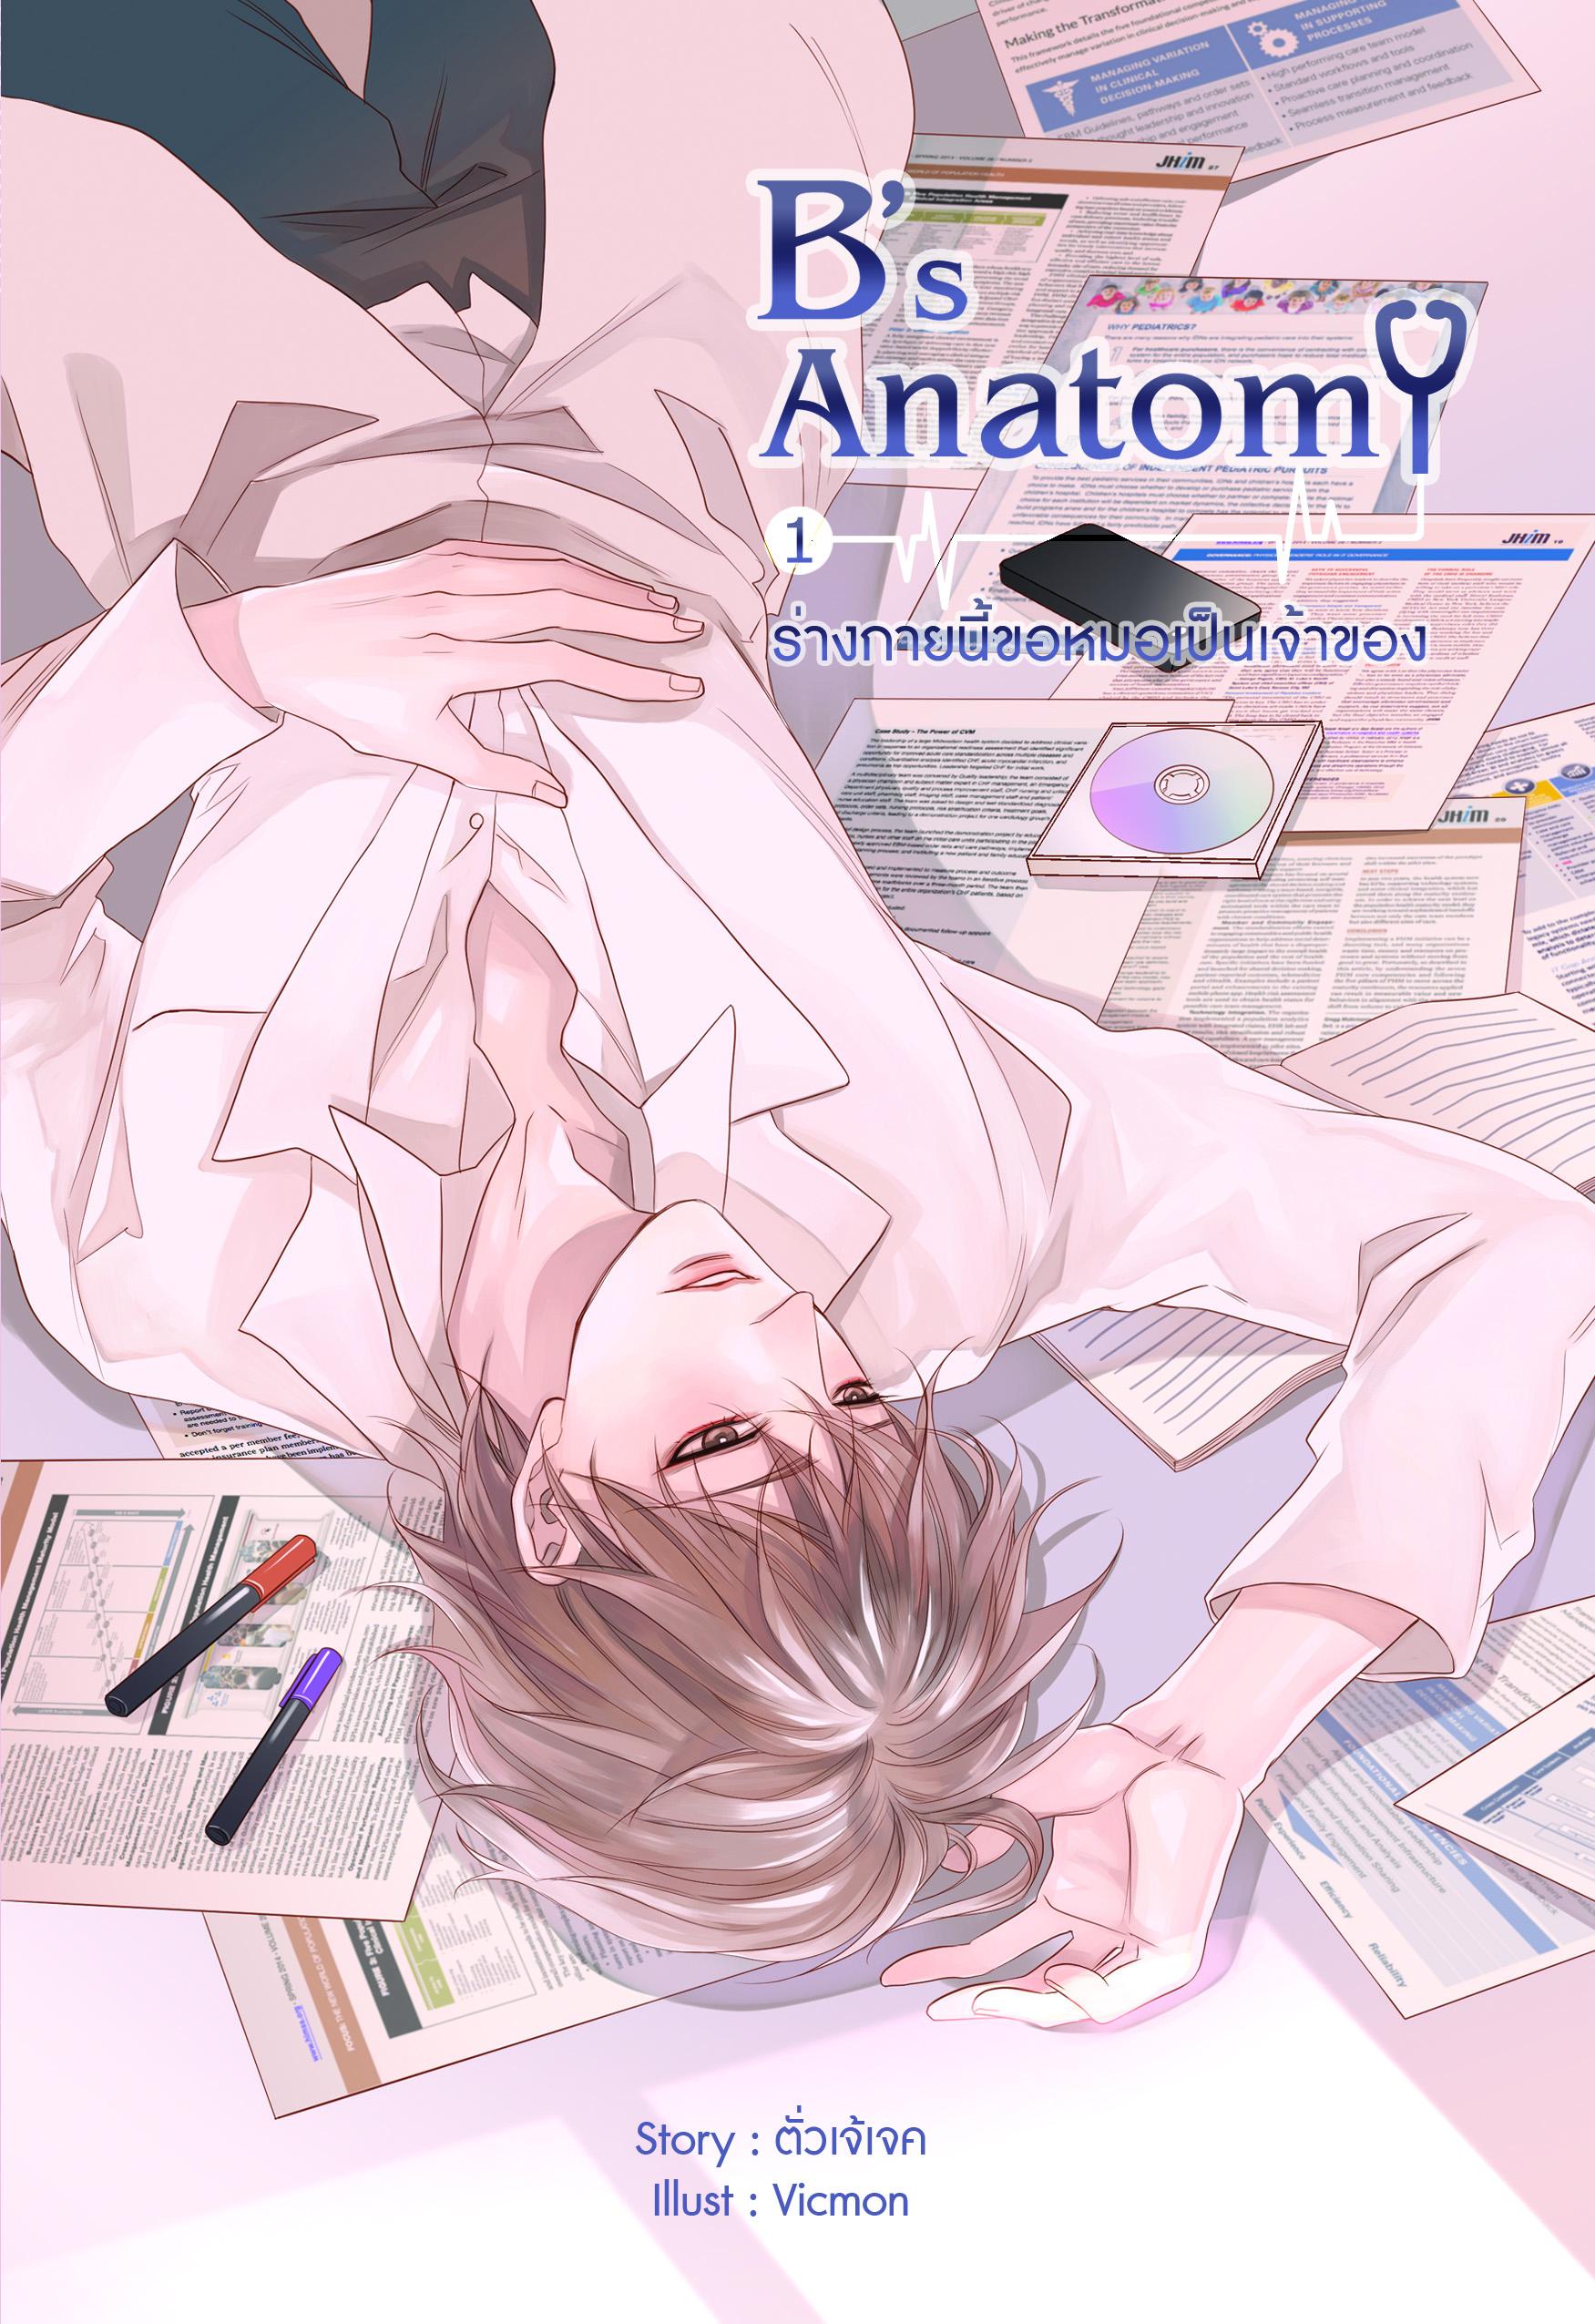 B's Anatomy ผู้เเต่ง ตั่วเจ้เจค